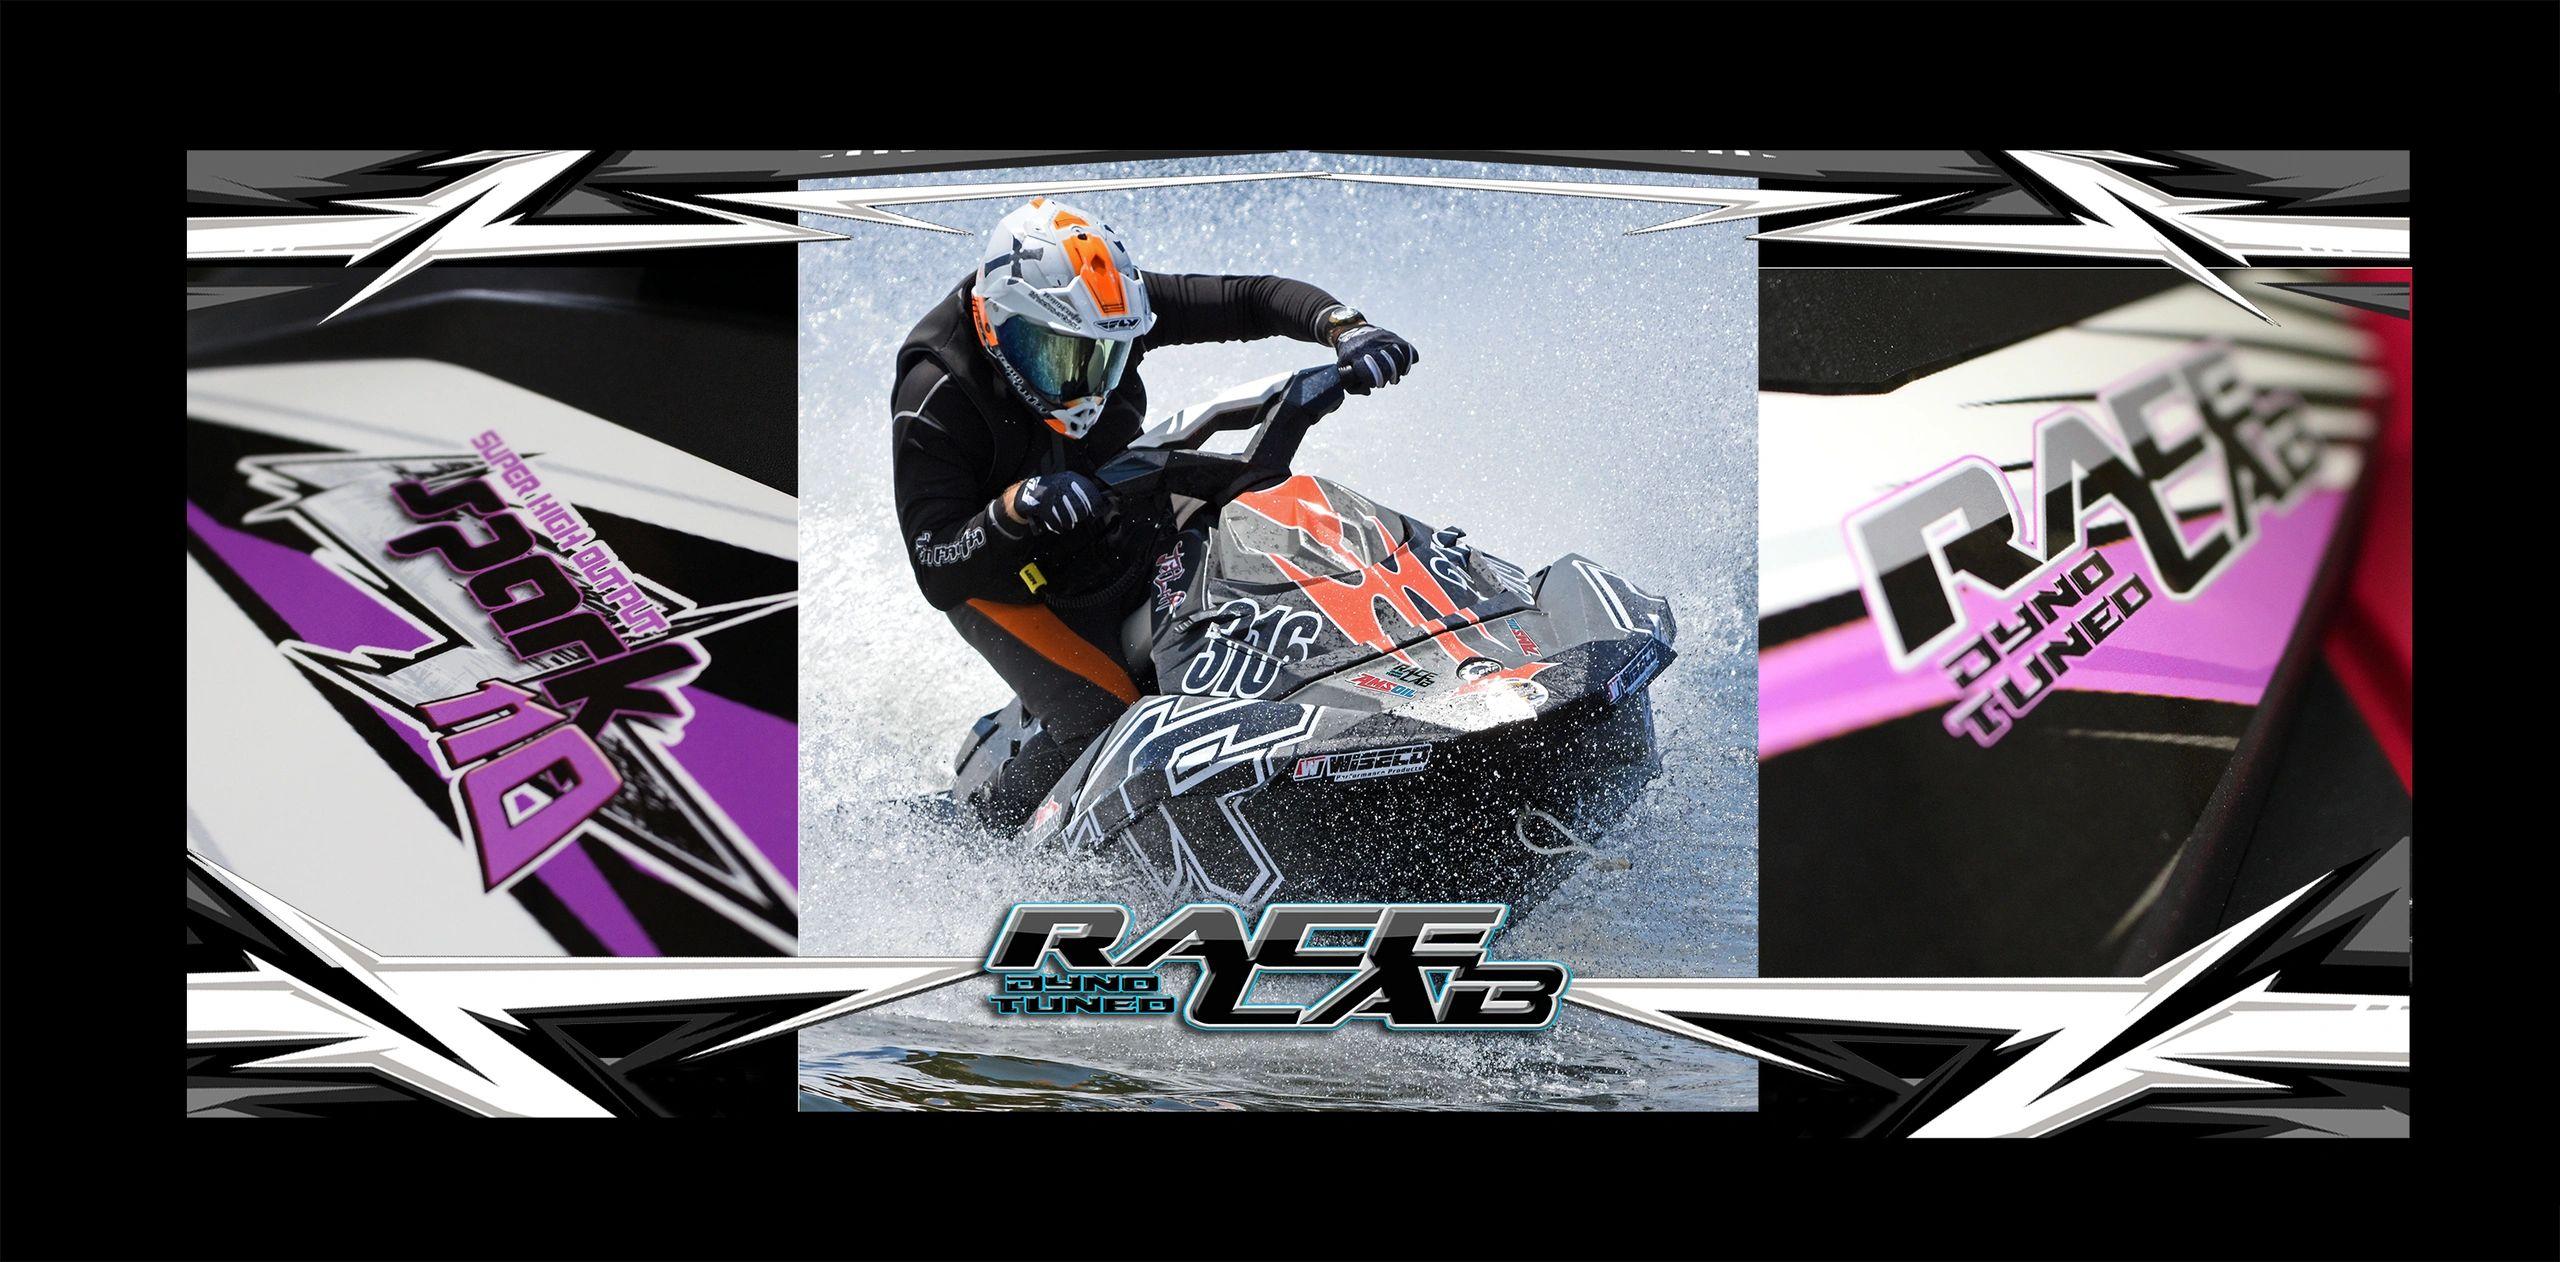 RaceLab - ECU Tuning Seadoo Spark 110hp, Dyno Tuned